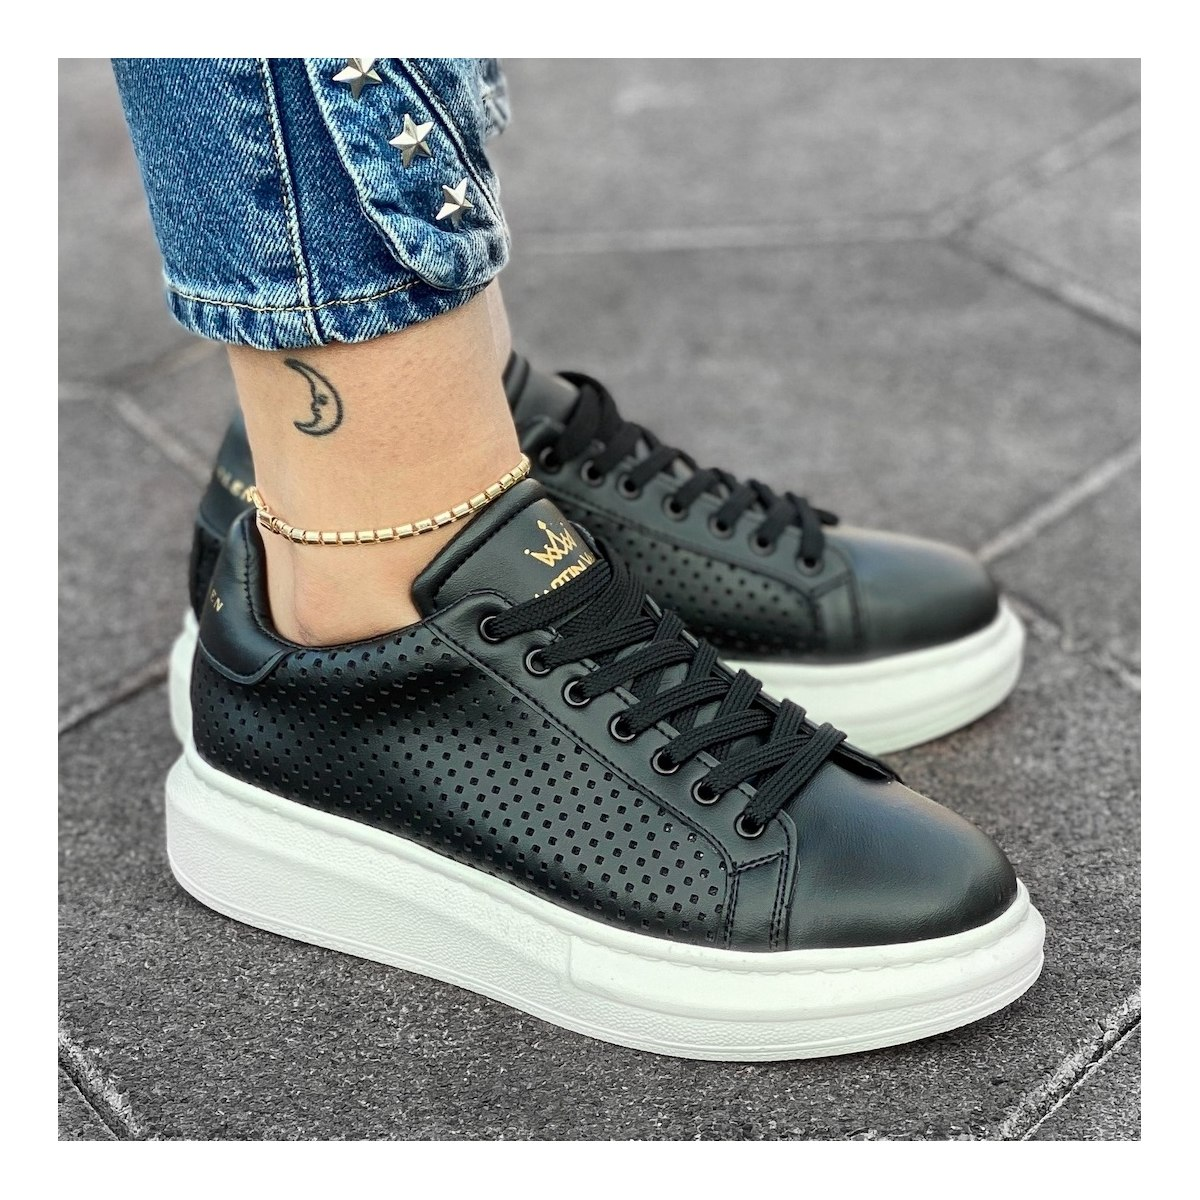 Woman Mega Side-Mesh Sneakers in Black-White